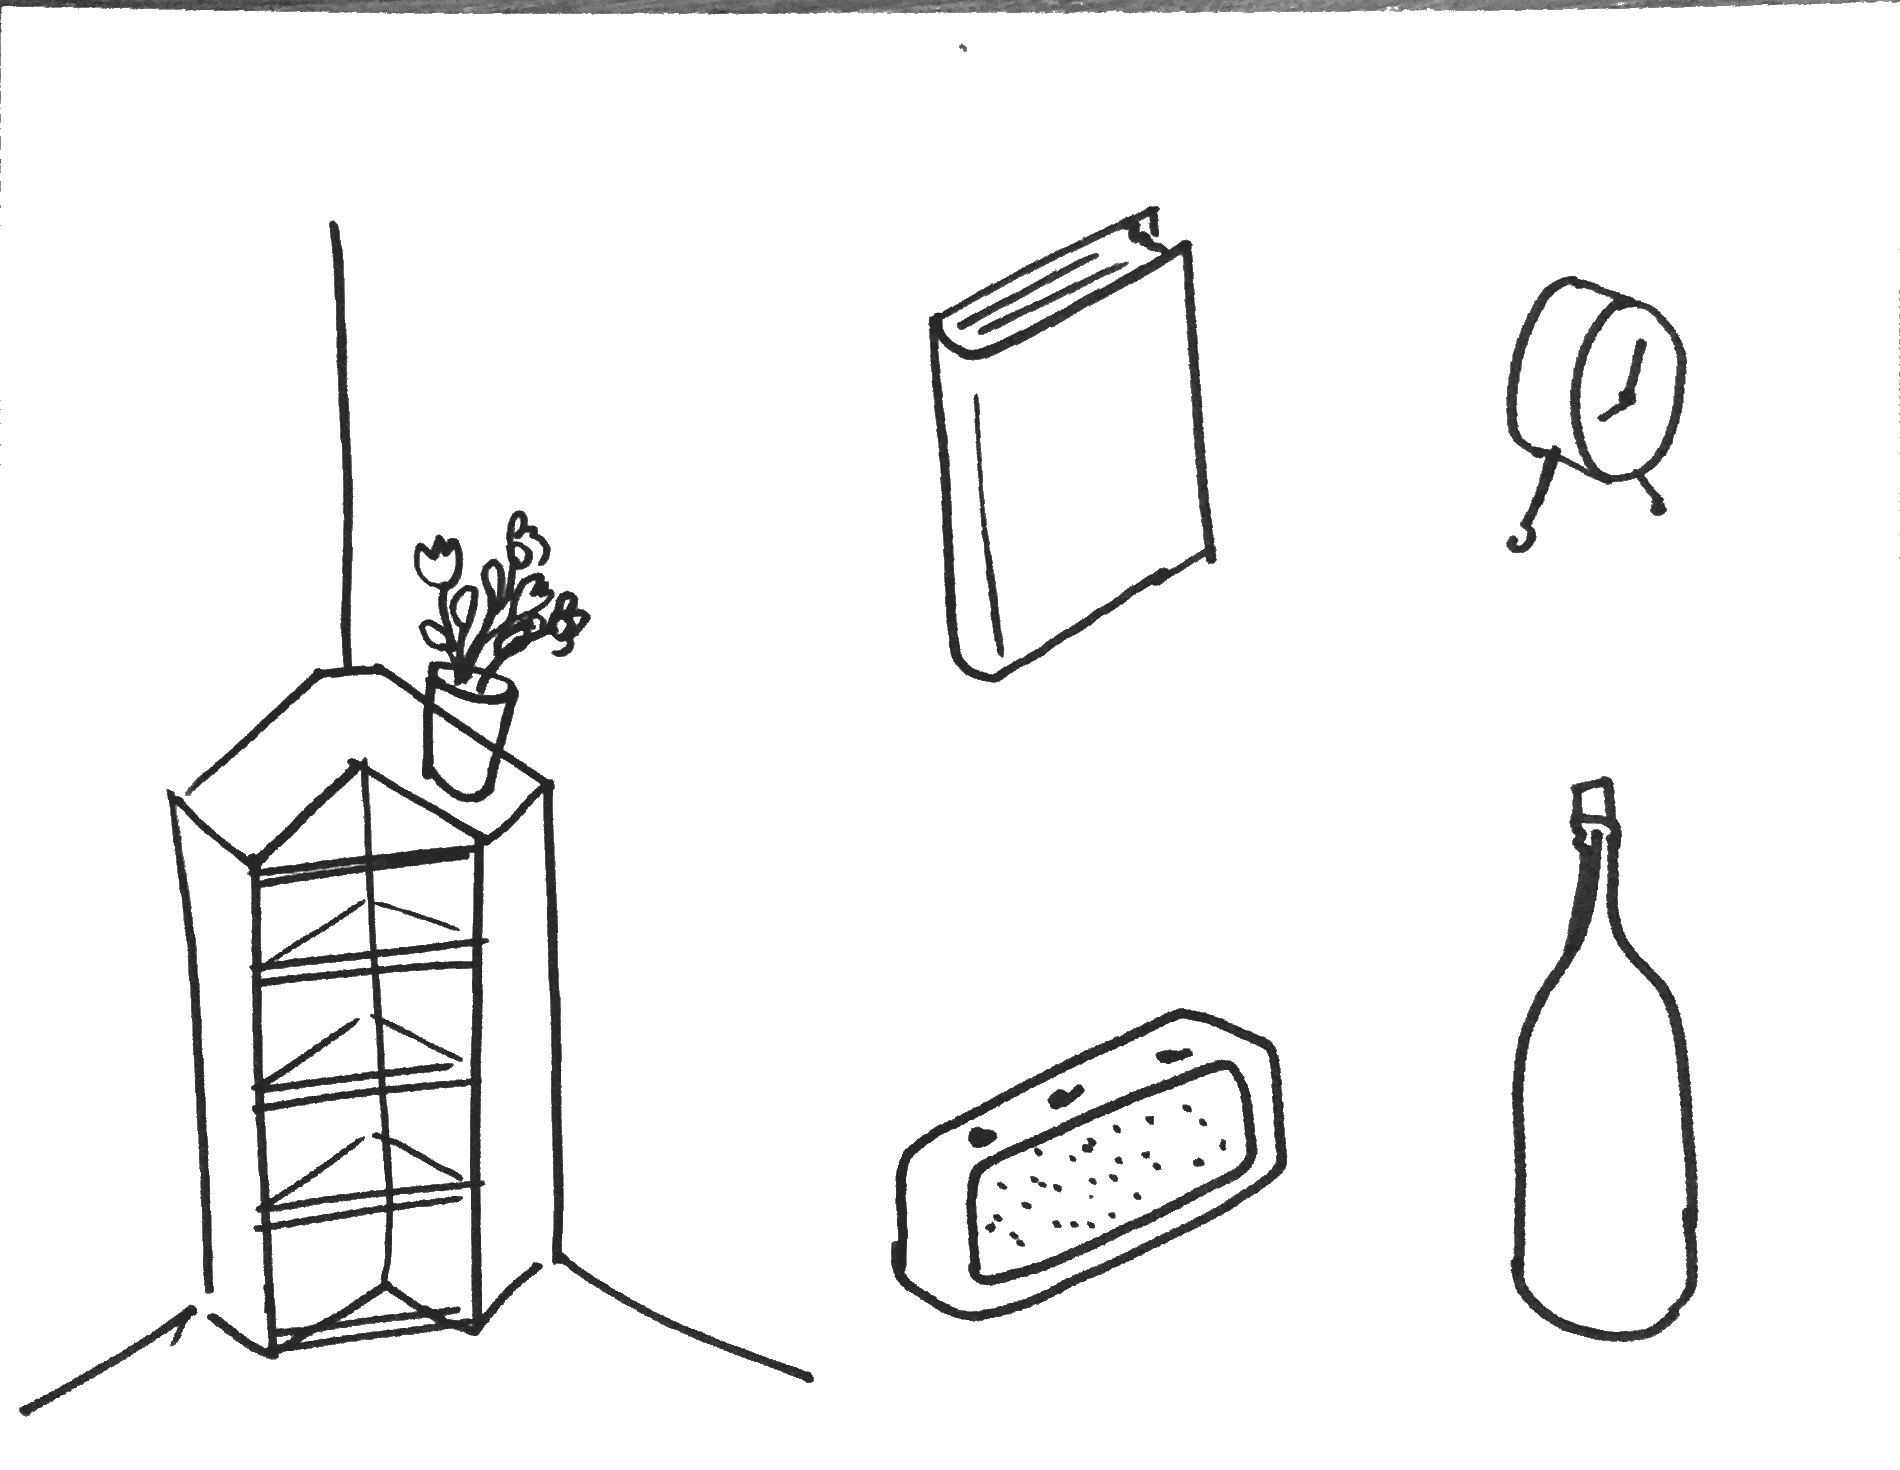 Desob 3 page #5.jpg